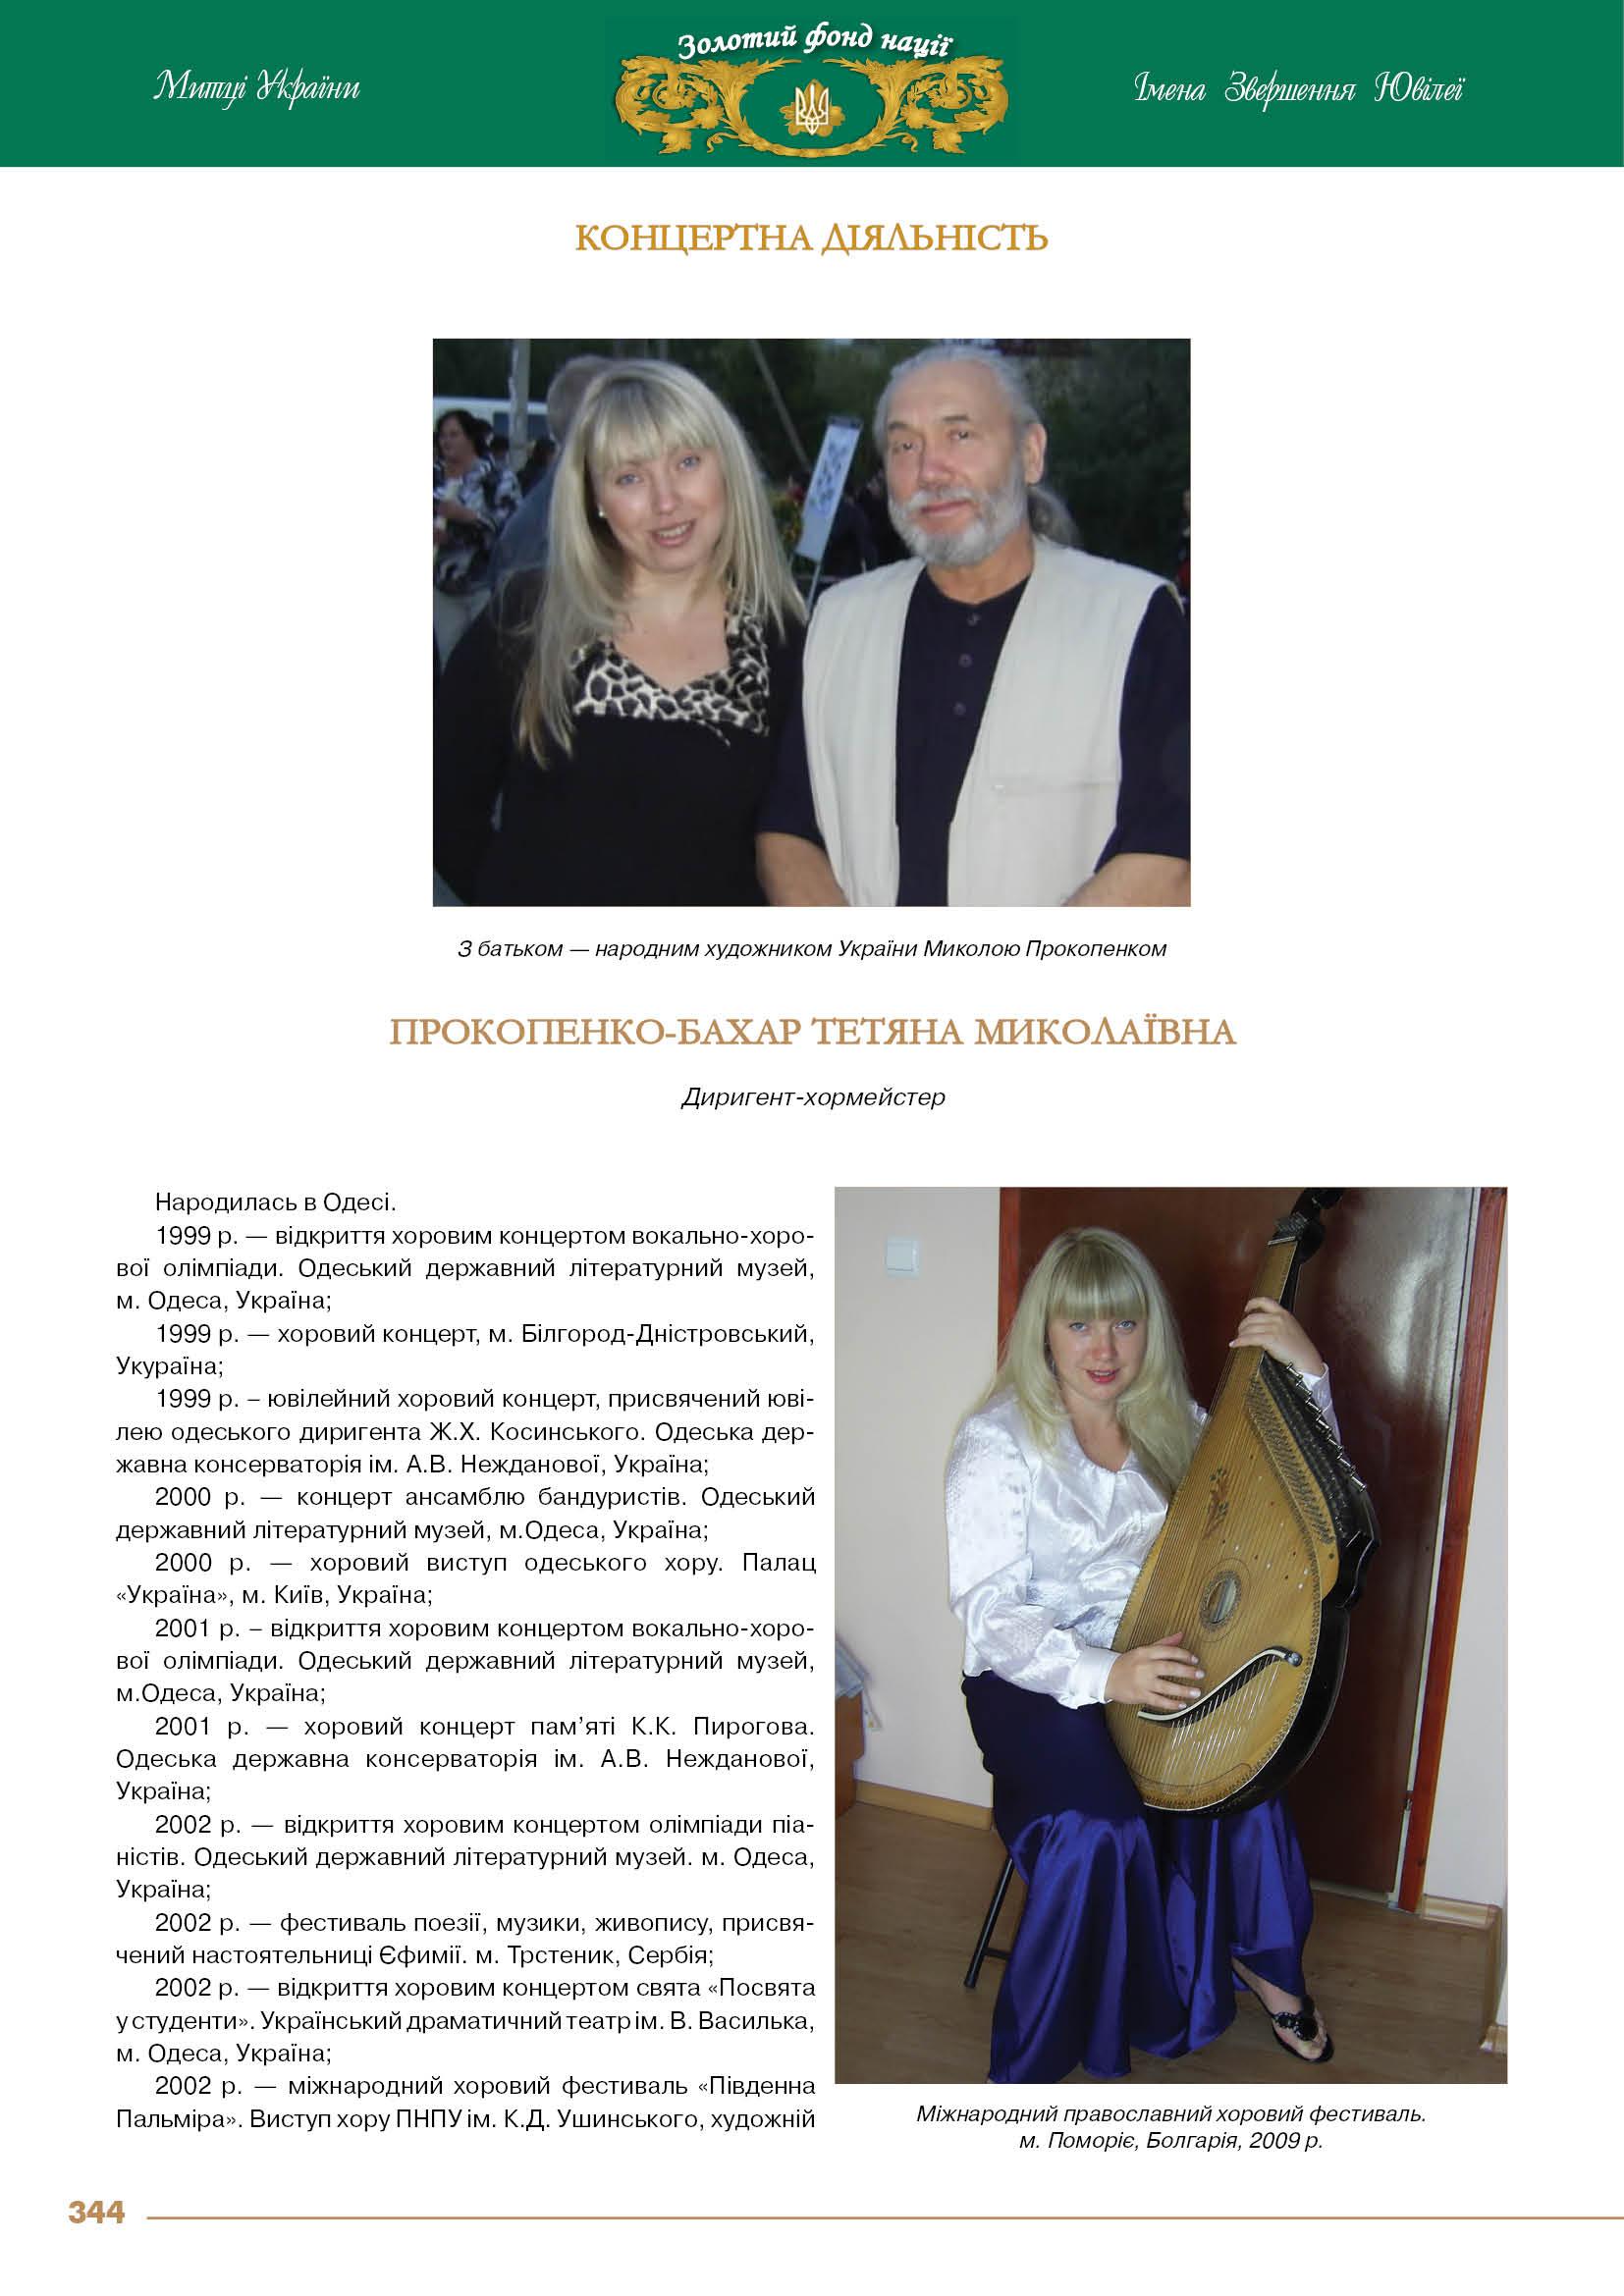 Прокопенко-Бахар Тетяна Миколаївна